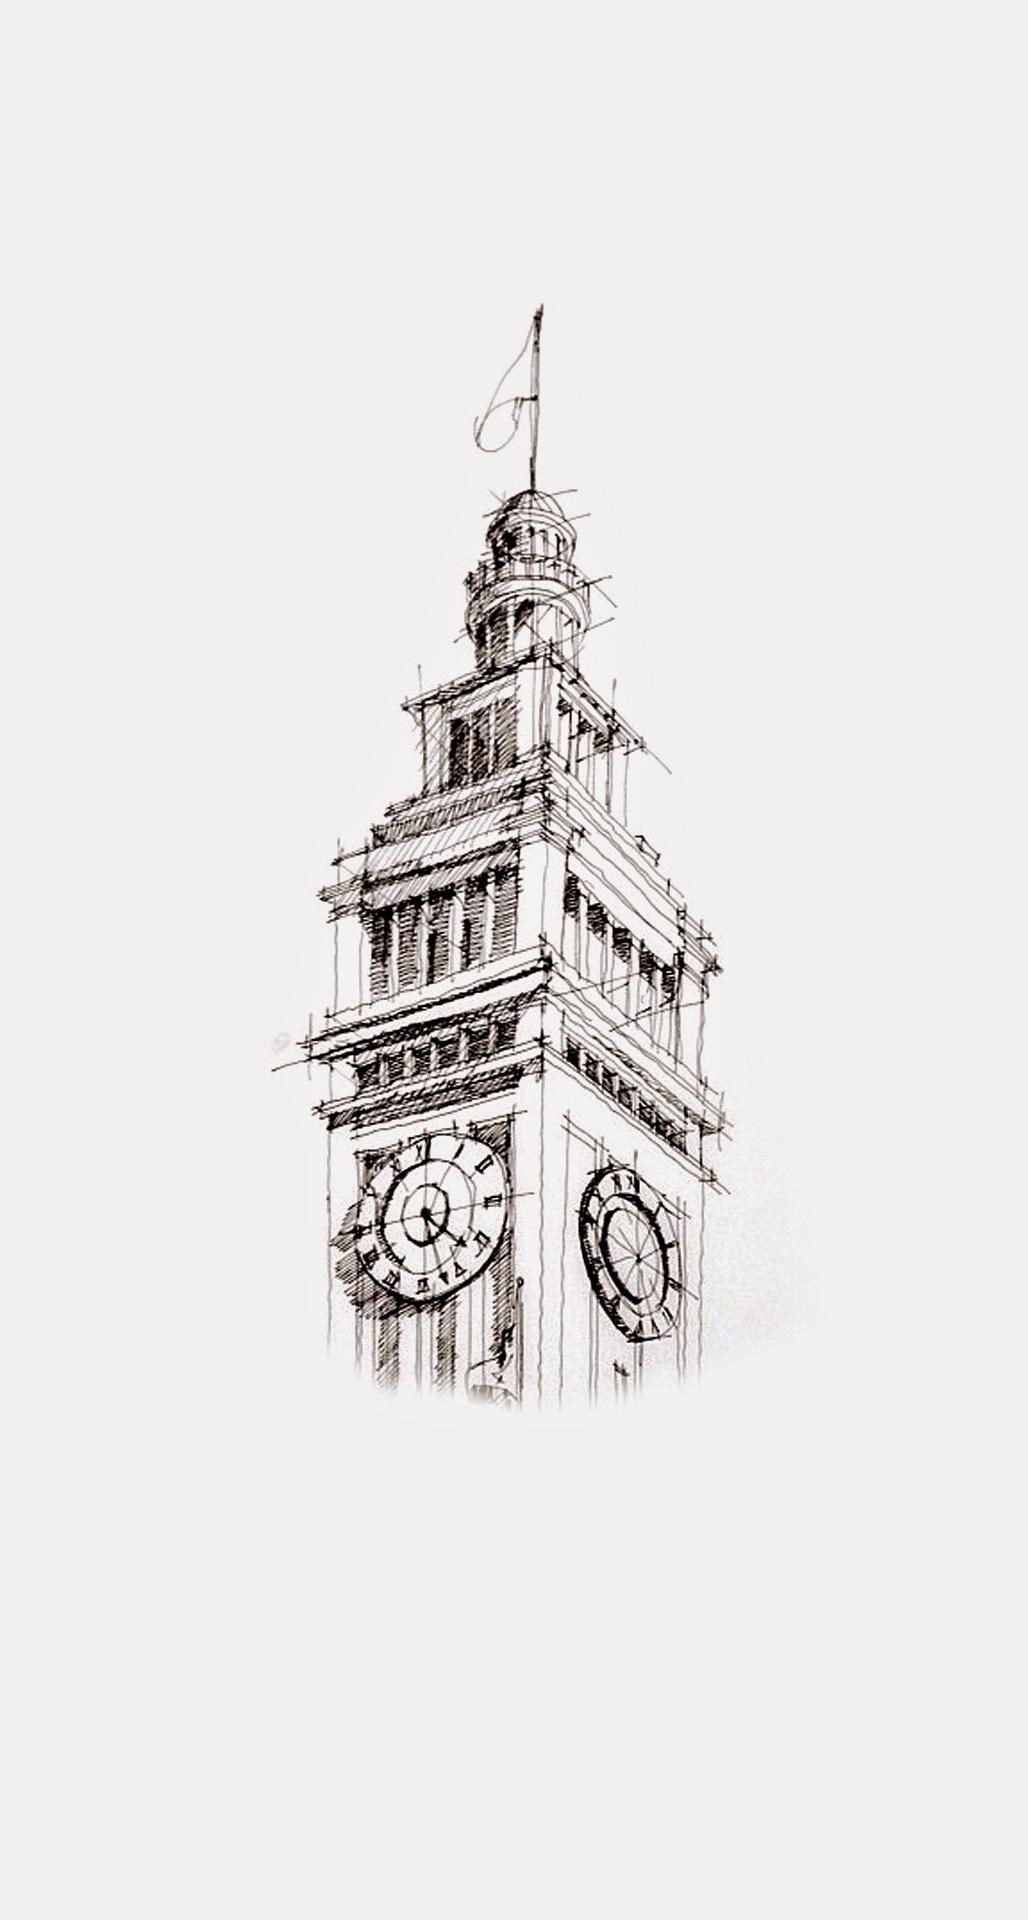 Architecture Sketch Wallpaper Iphone - HD Wallpaper